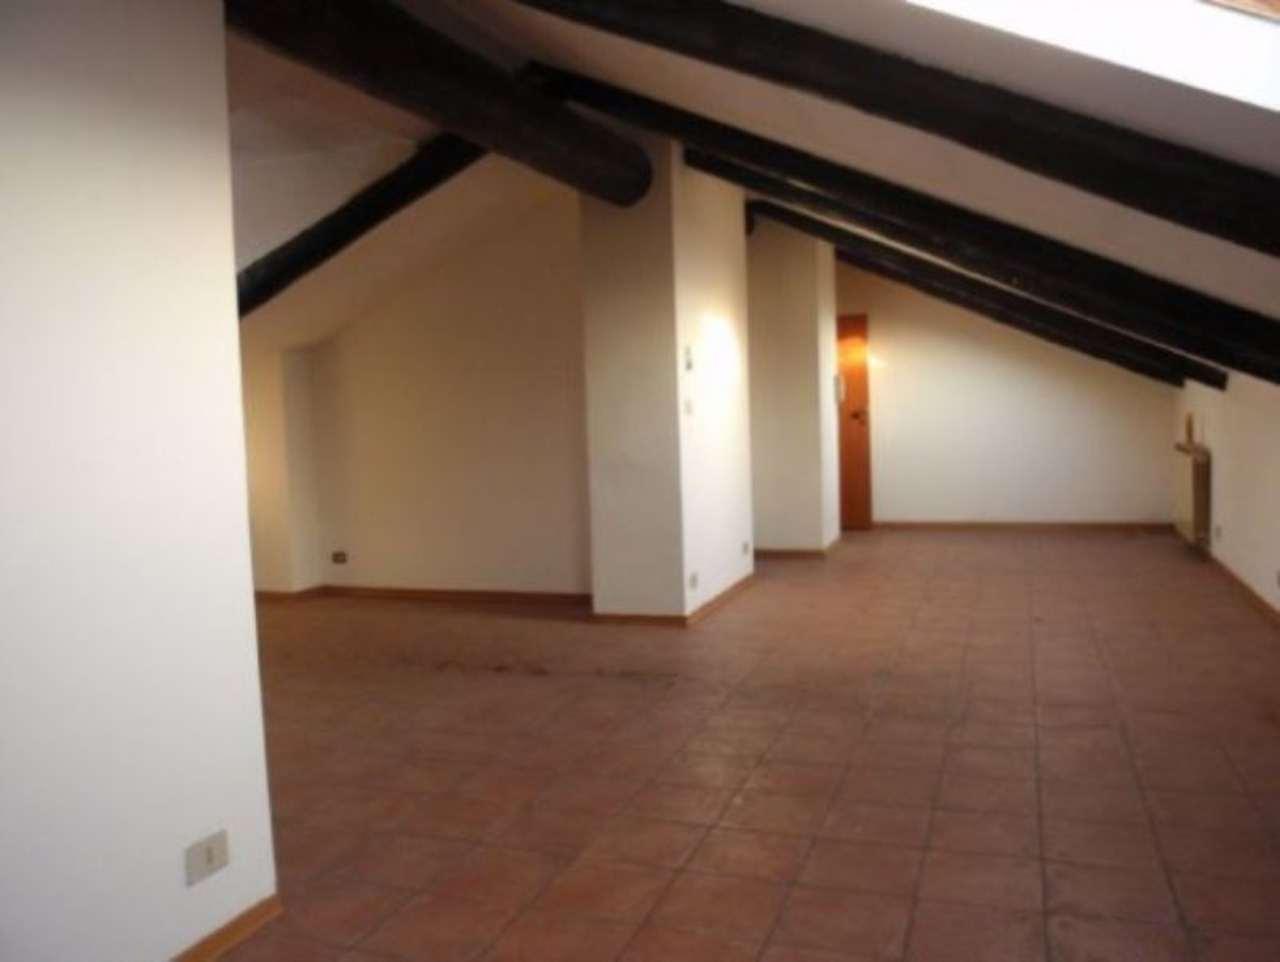 Bilocale Torino Zona Valdocco / Via Brindisi, 15 1